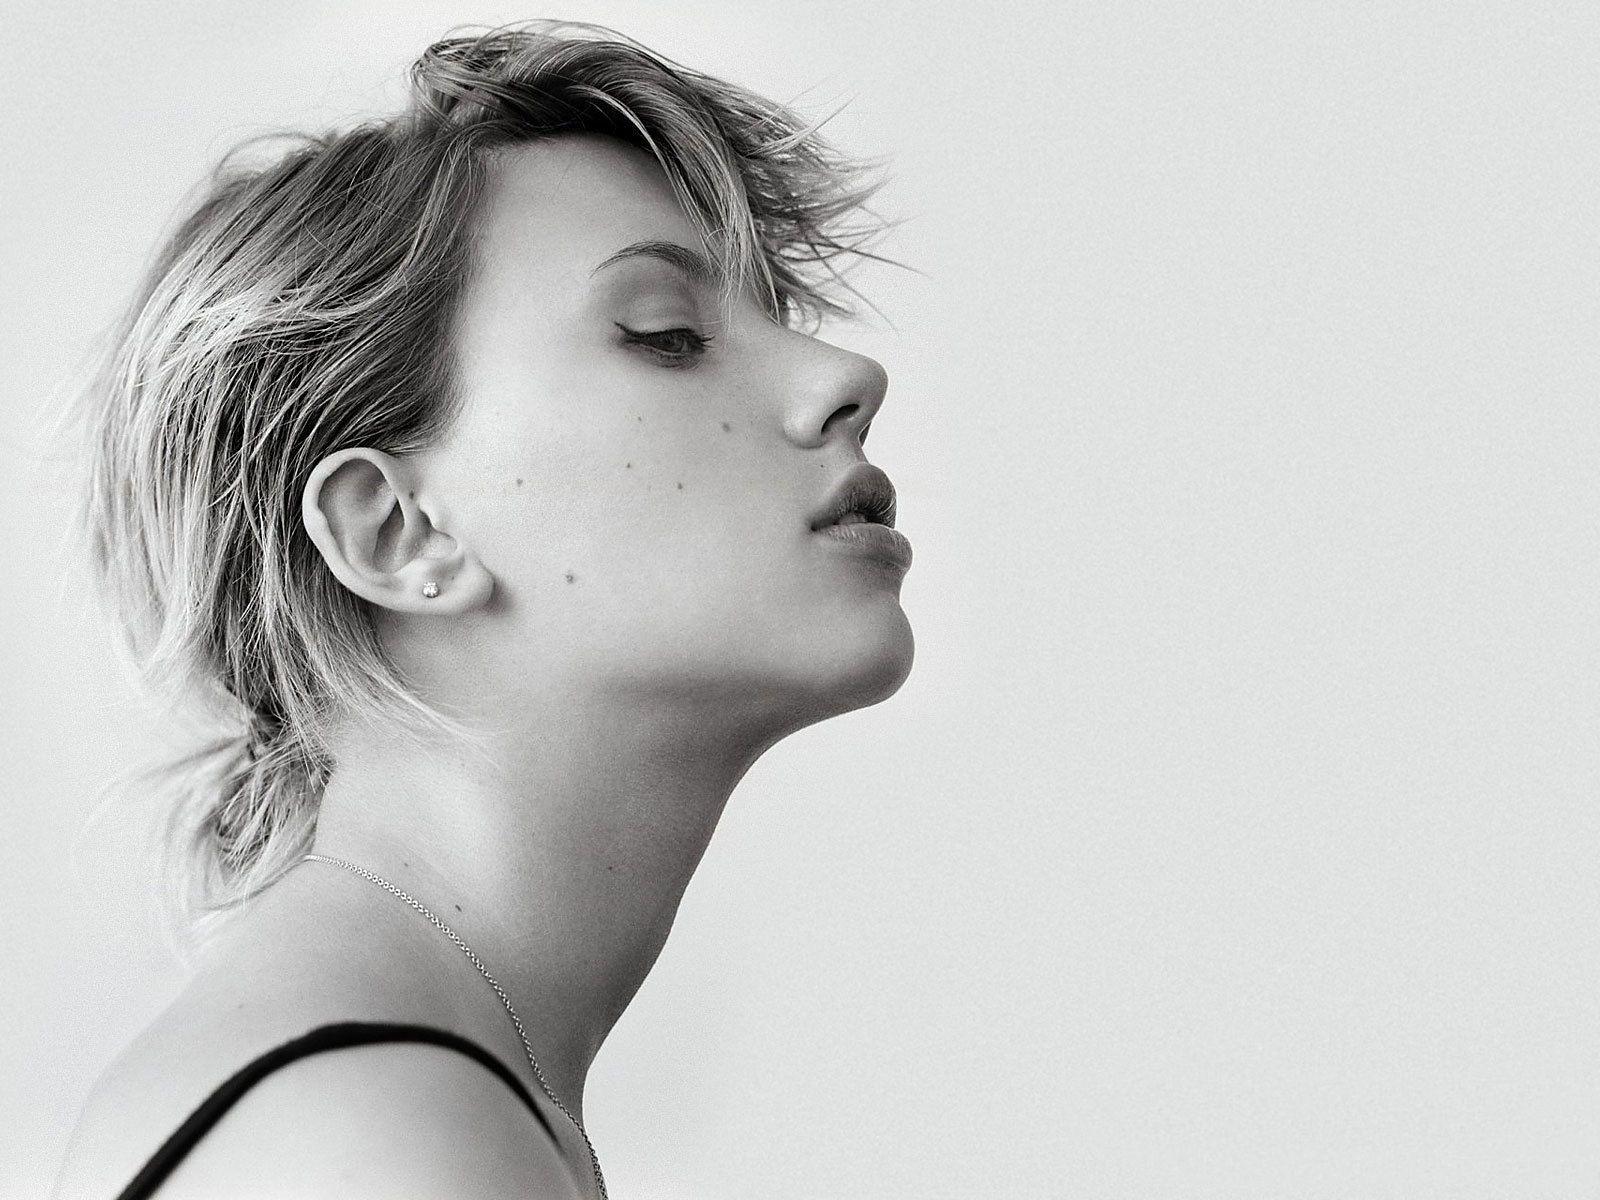 1000+ Great Celebrity Photos · Pexels · Free Stock Photos